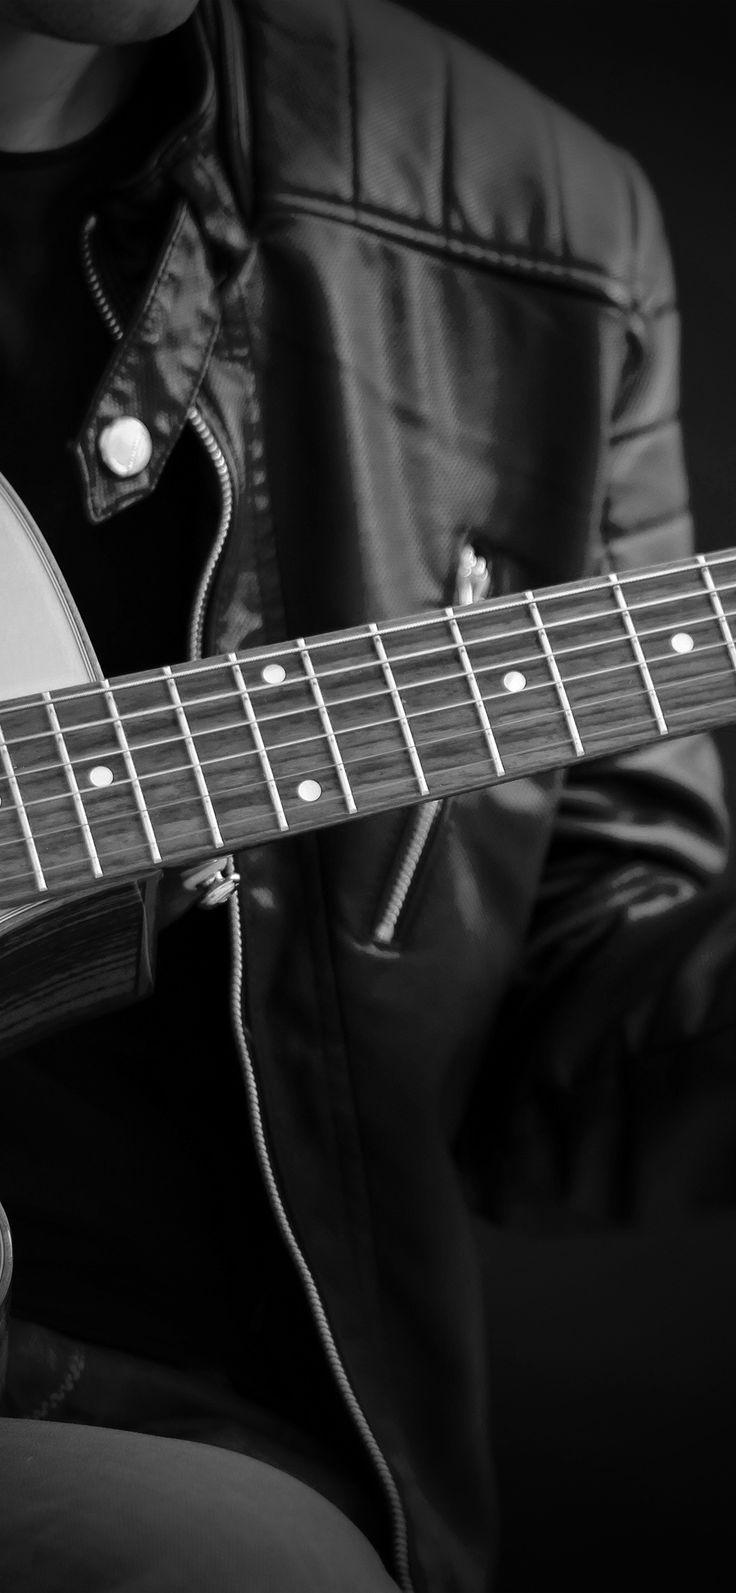 Iphone X Wallpaper : nc11-guitar-classical-music-art-guy-bw